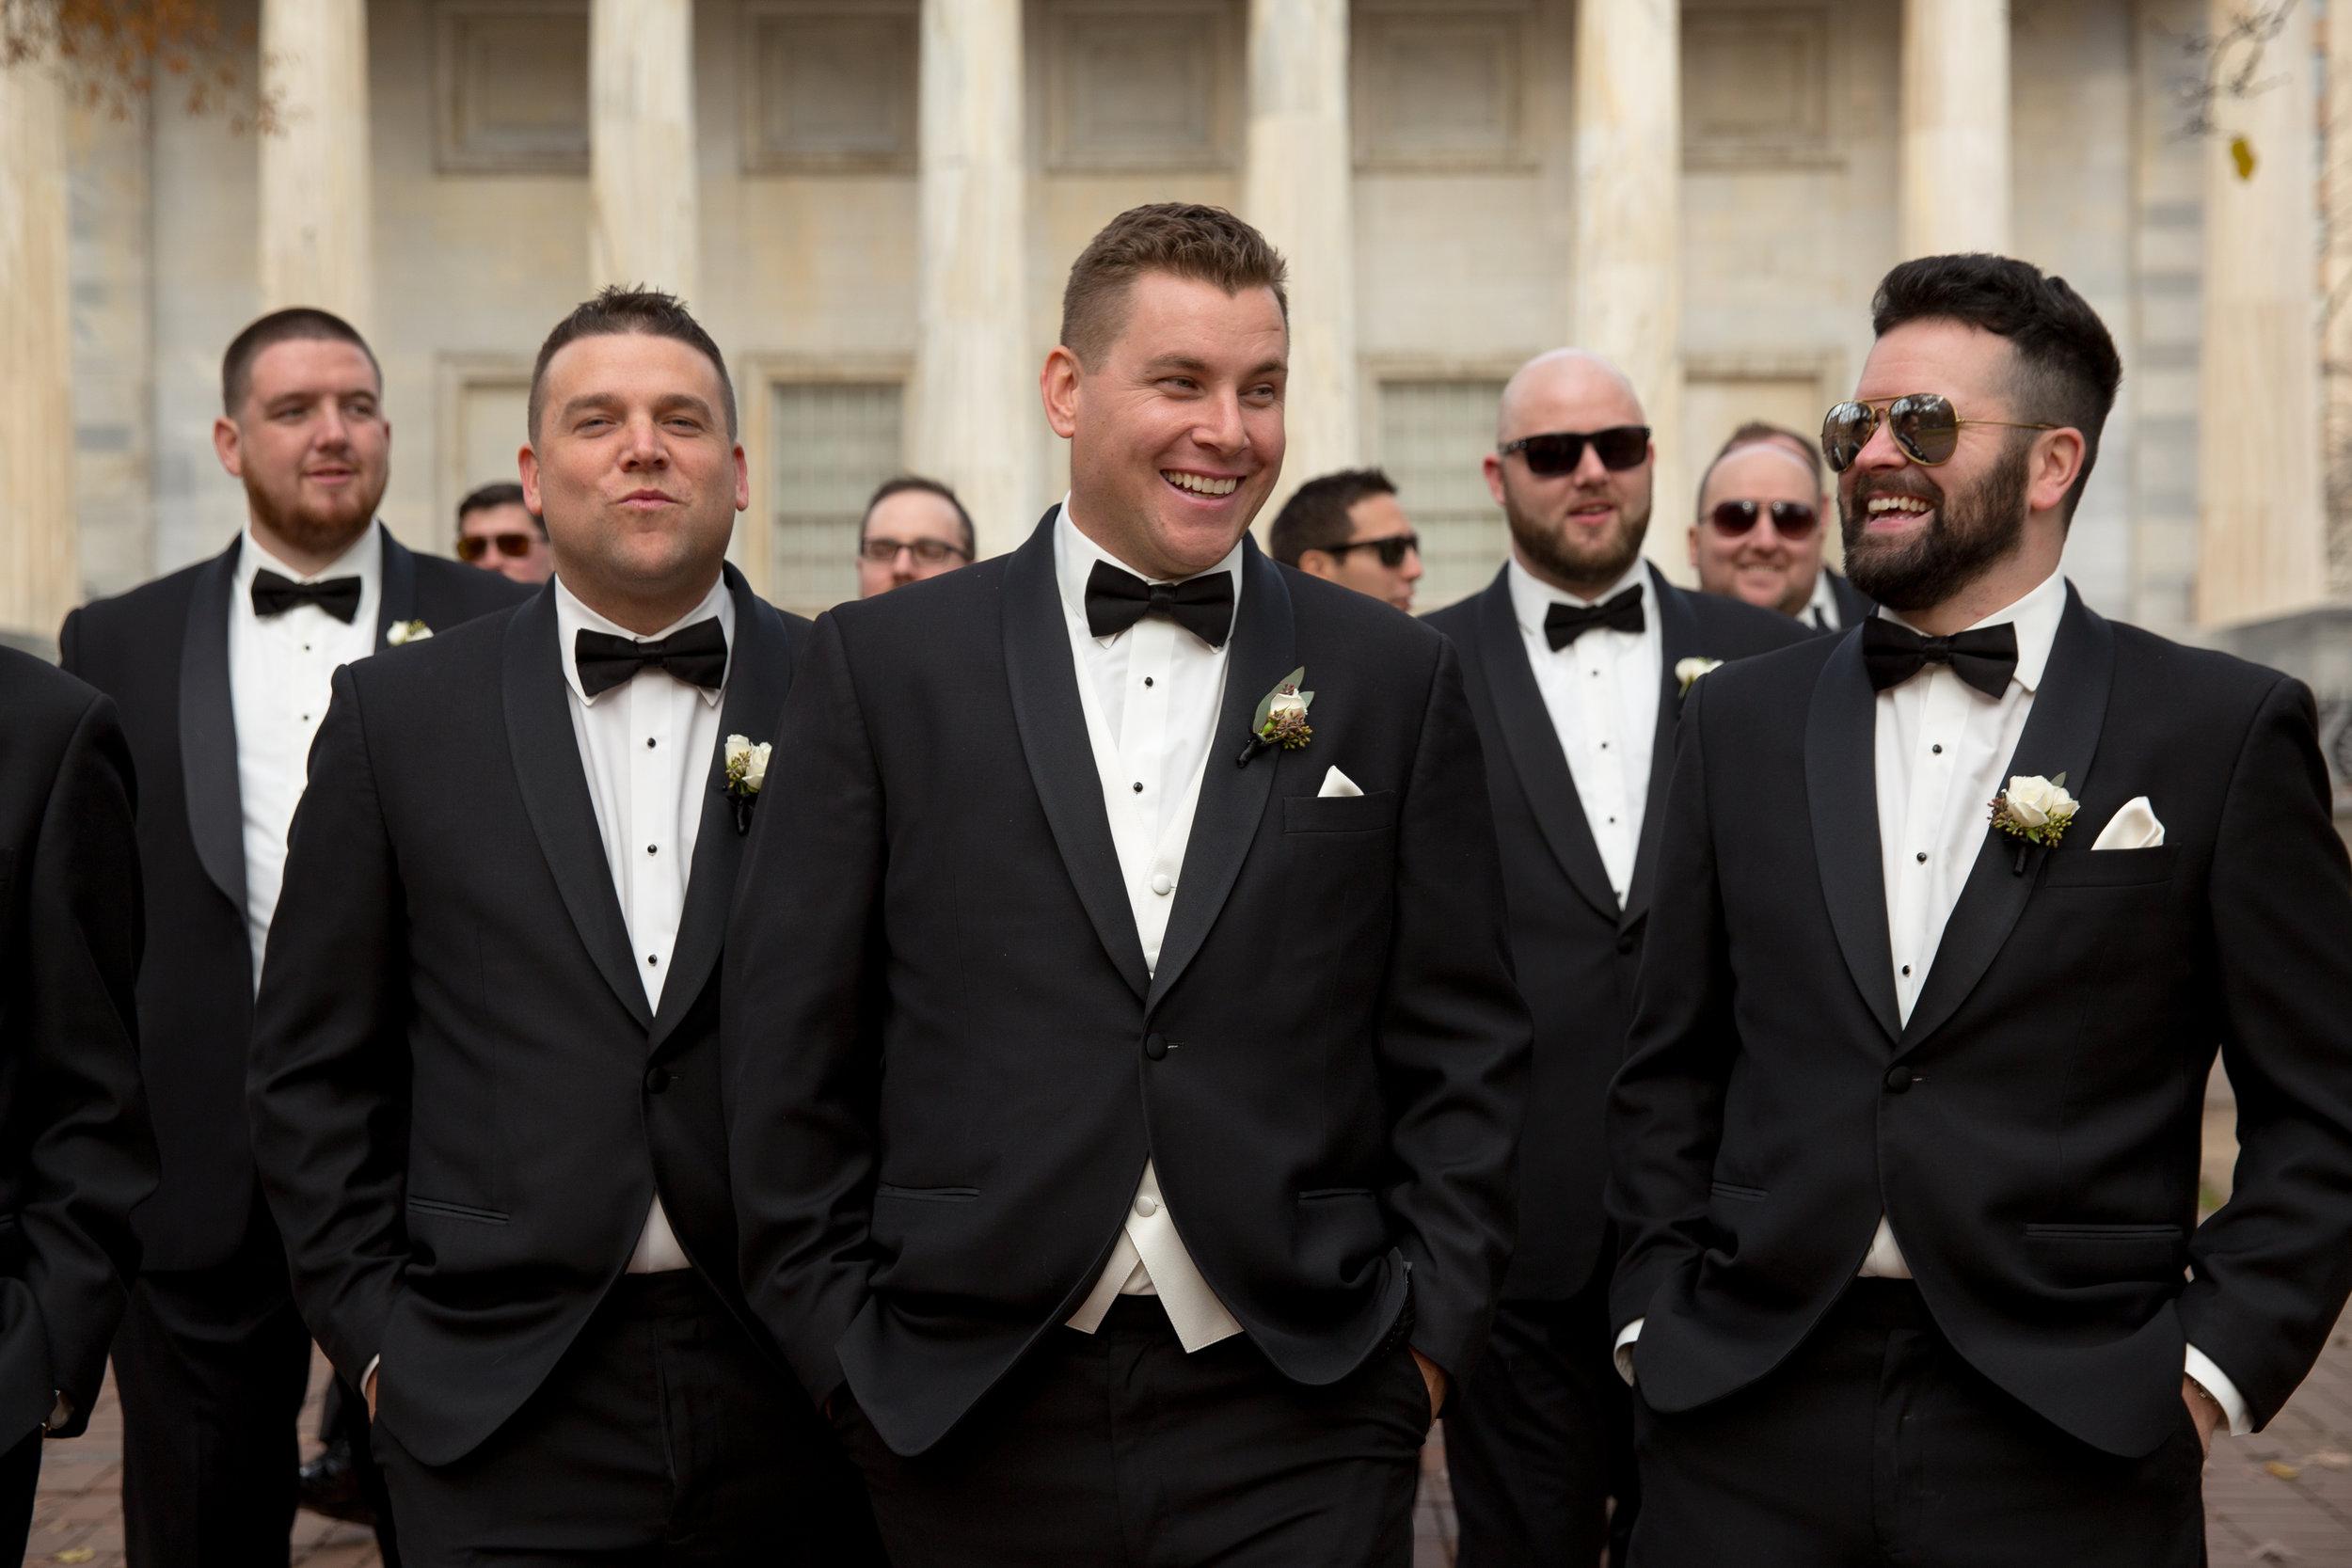 curtis-atrium-wedding-philadelphia-christine-charles-18.jpg